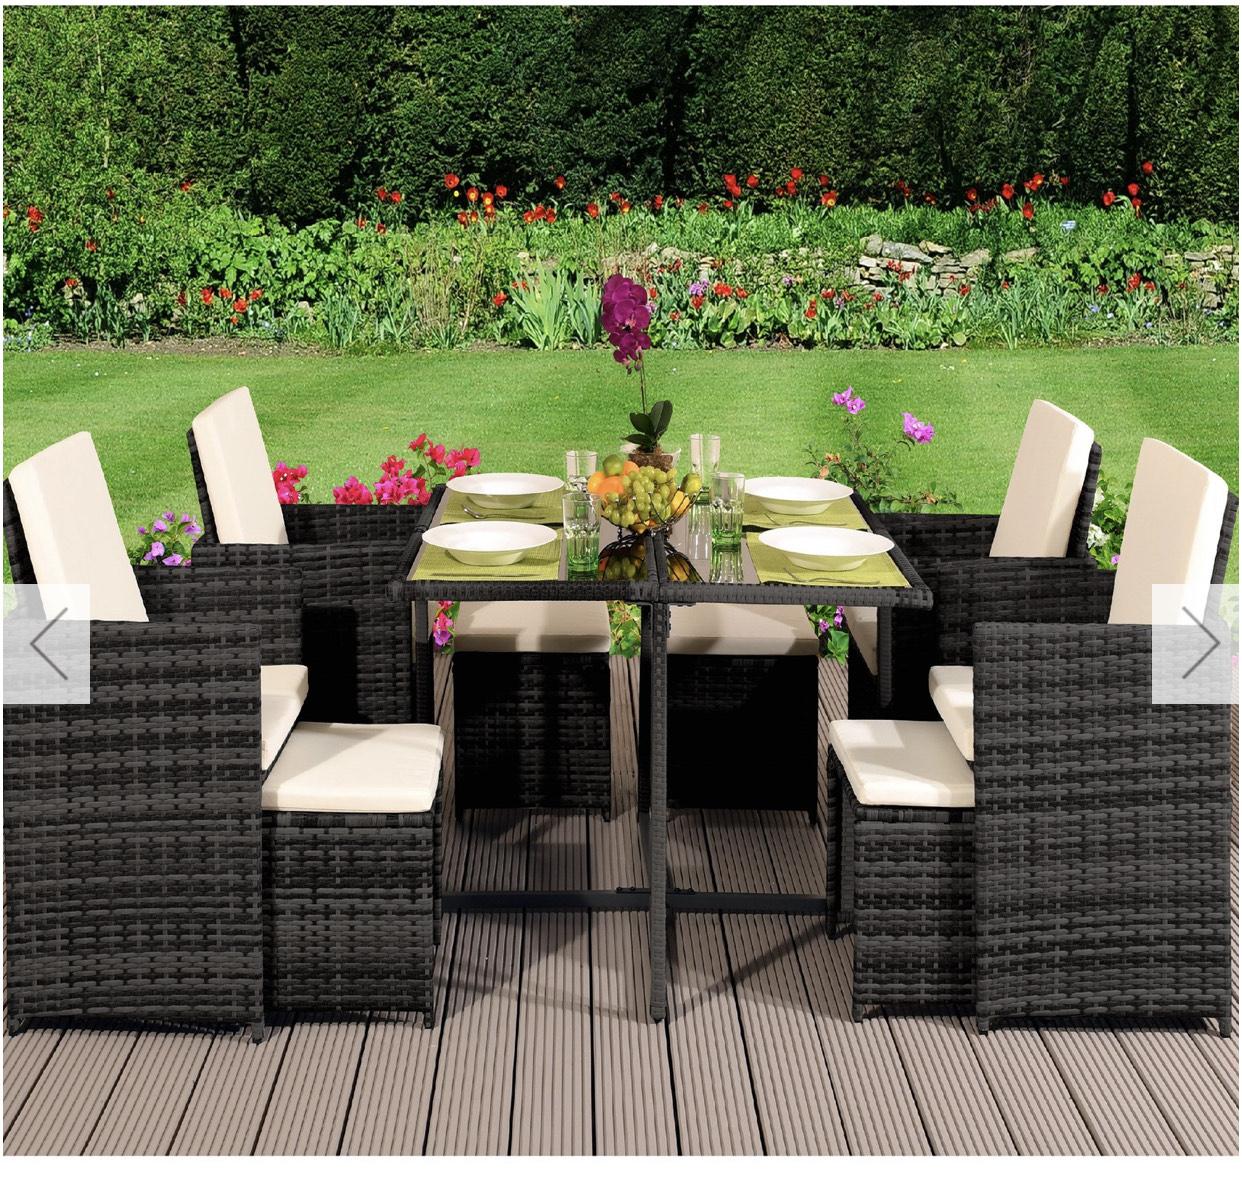 9 Piece Cube Rattan Garden Furniture Set - Various Colours £549.99 at The Range